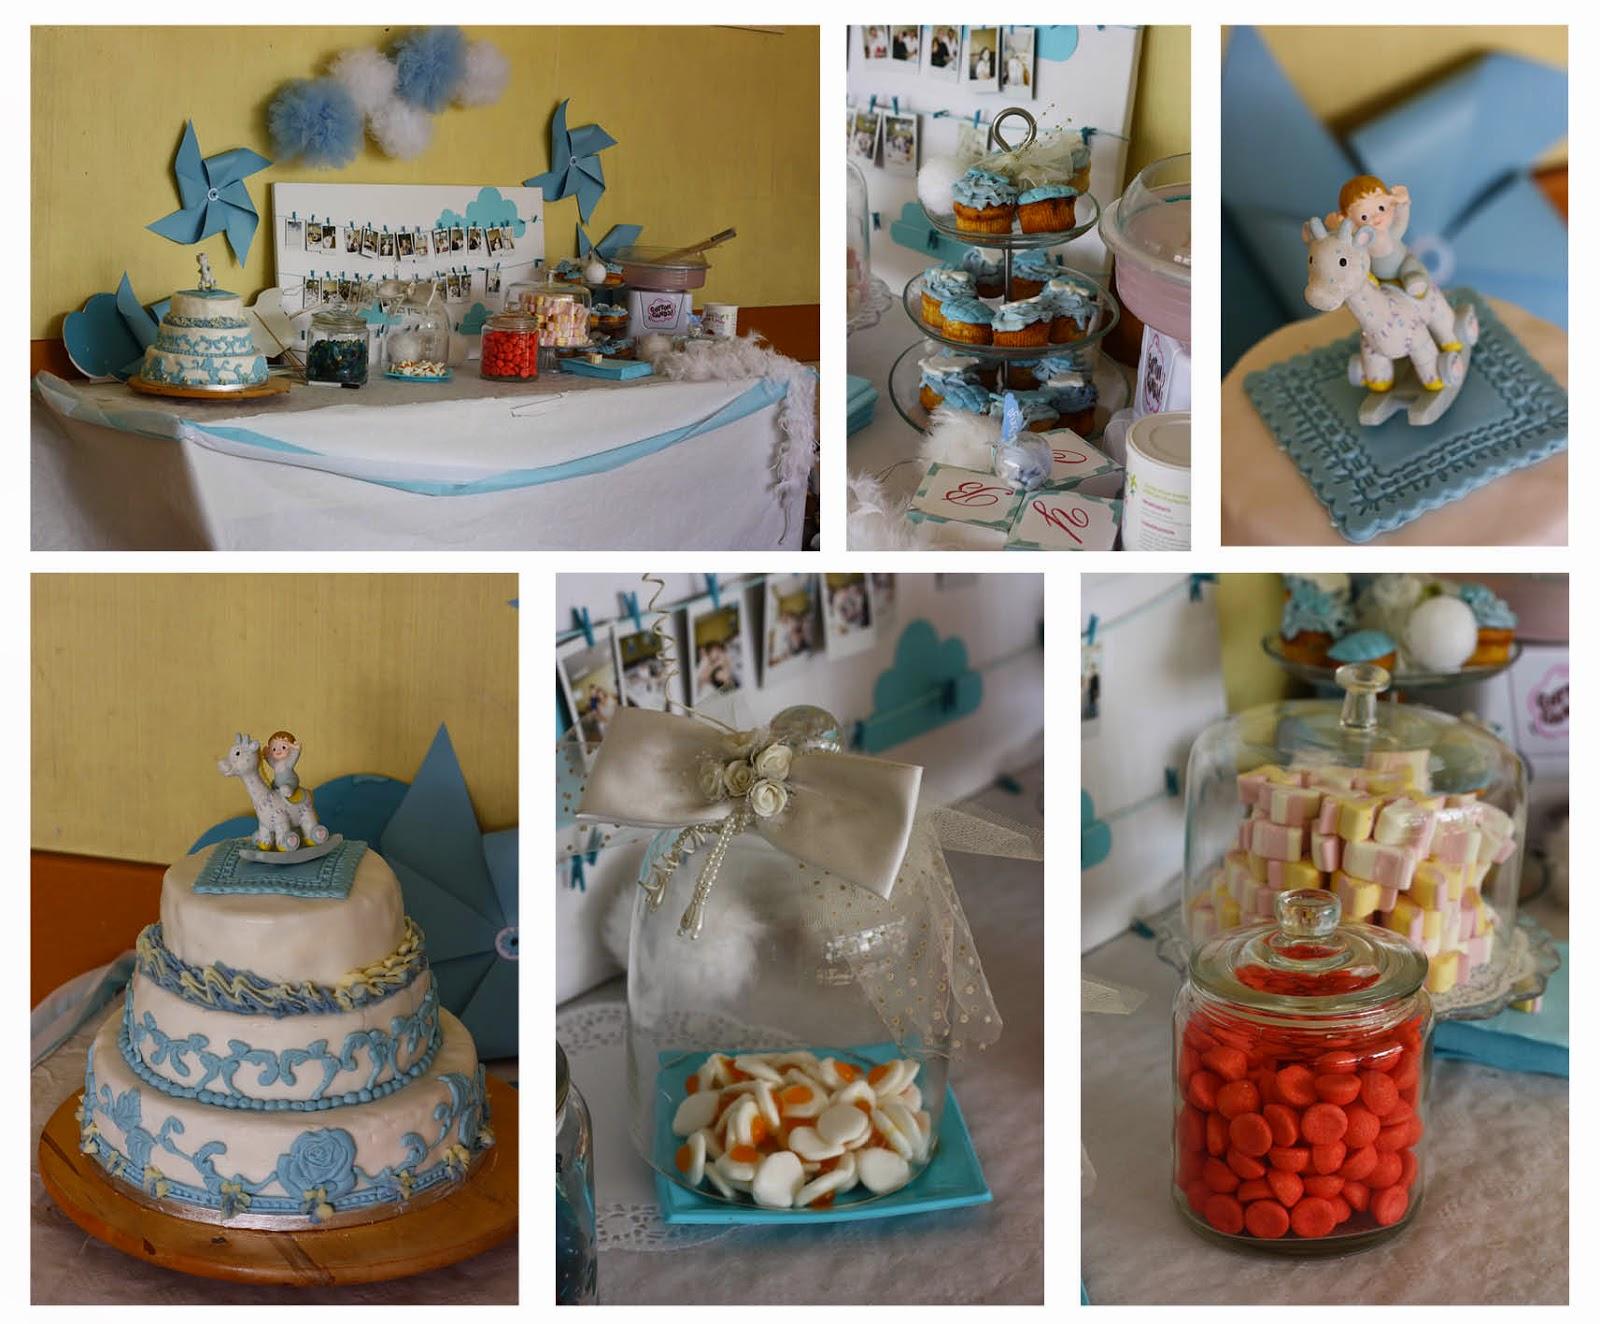 Baby shower candy table displays grosir baju surabaya - Decoration bapteme garcon ...